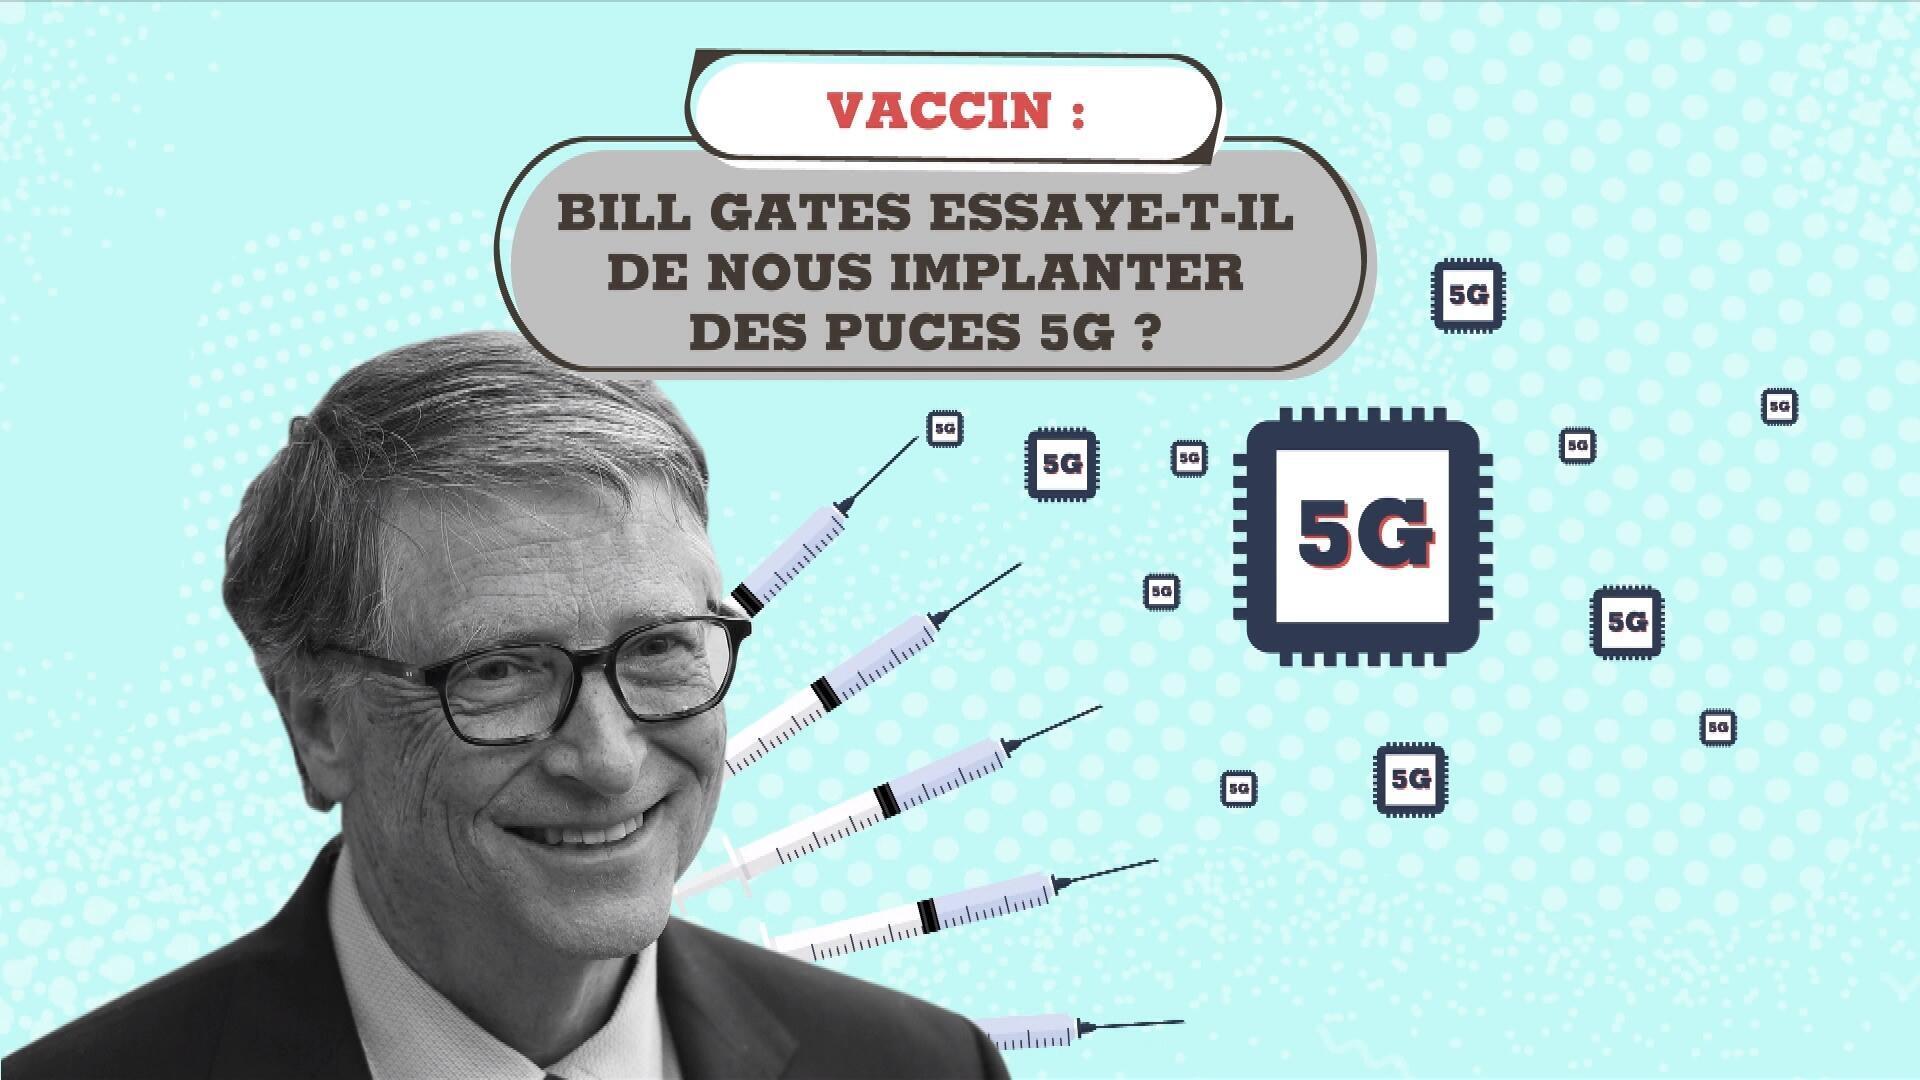 2021-07-15 13:04 FR WB ICI L EUROPE FAKE NEWS BILL GATES